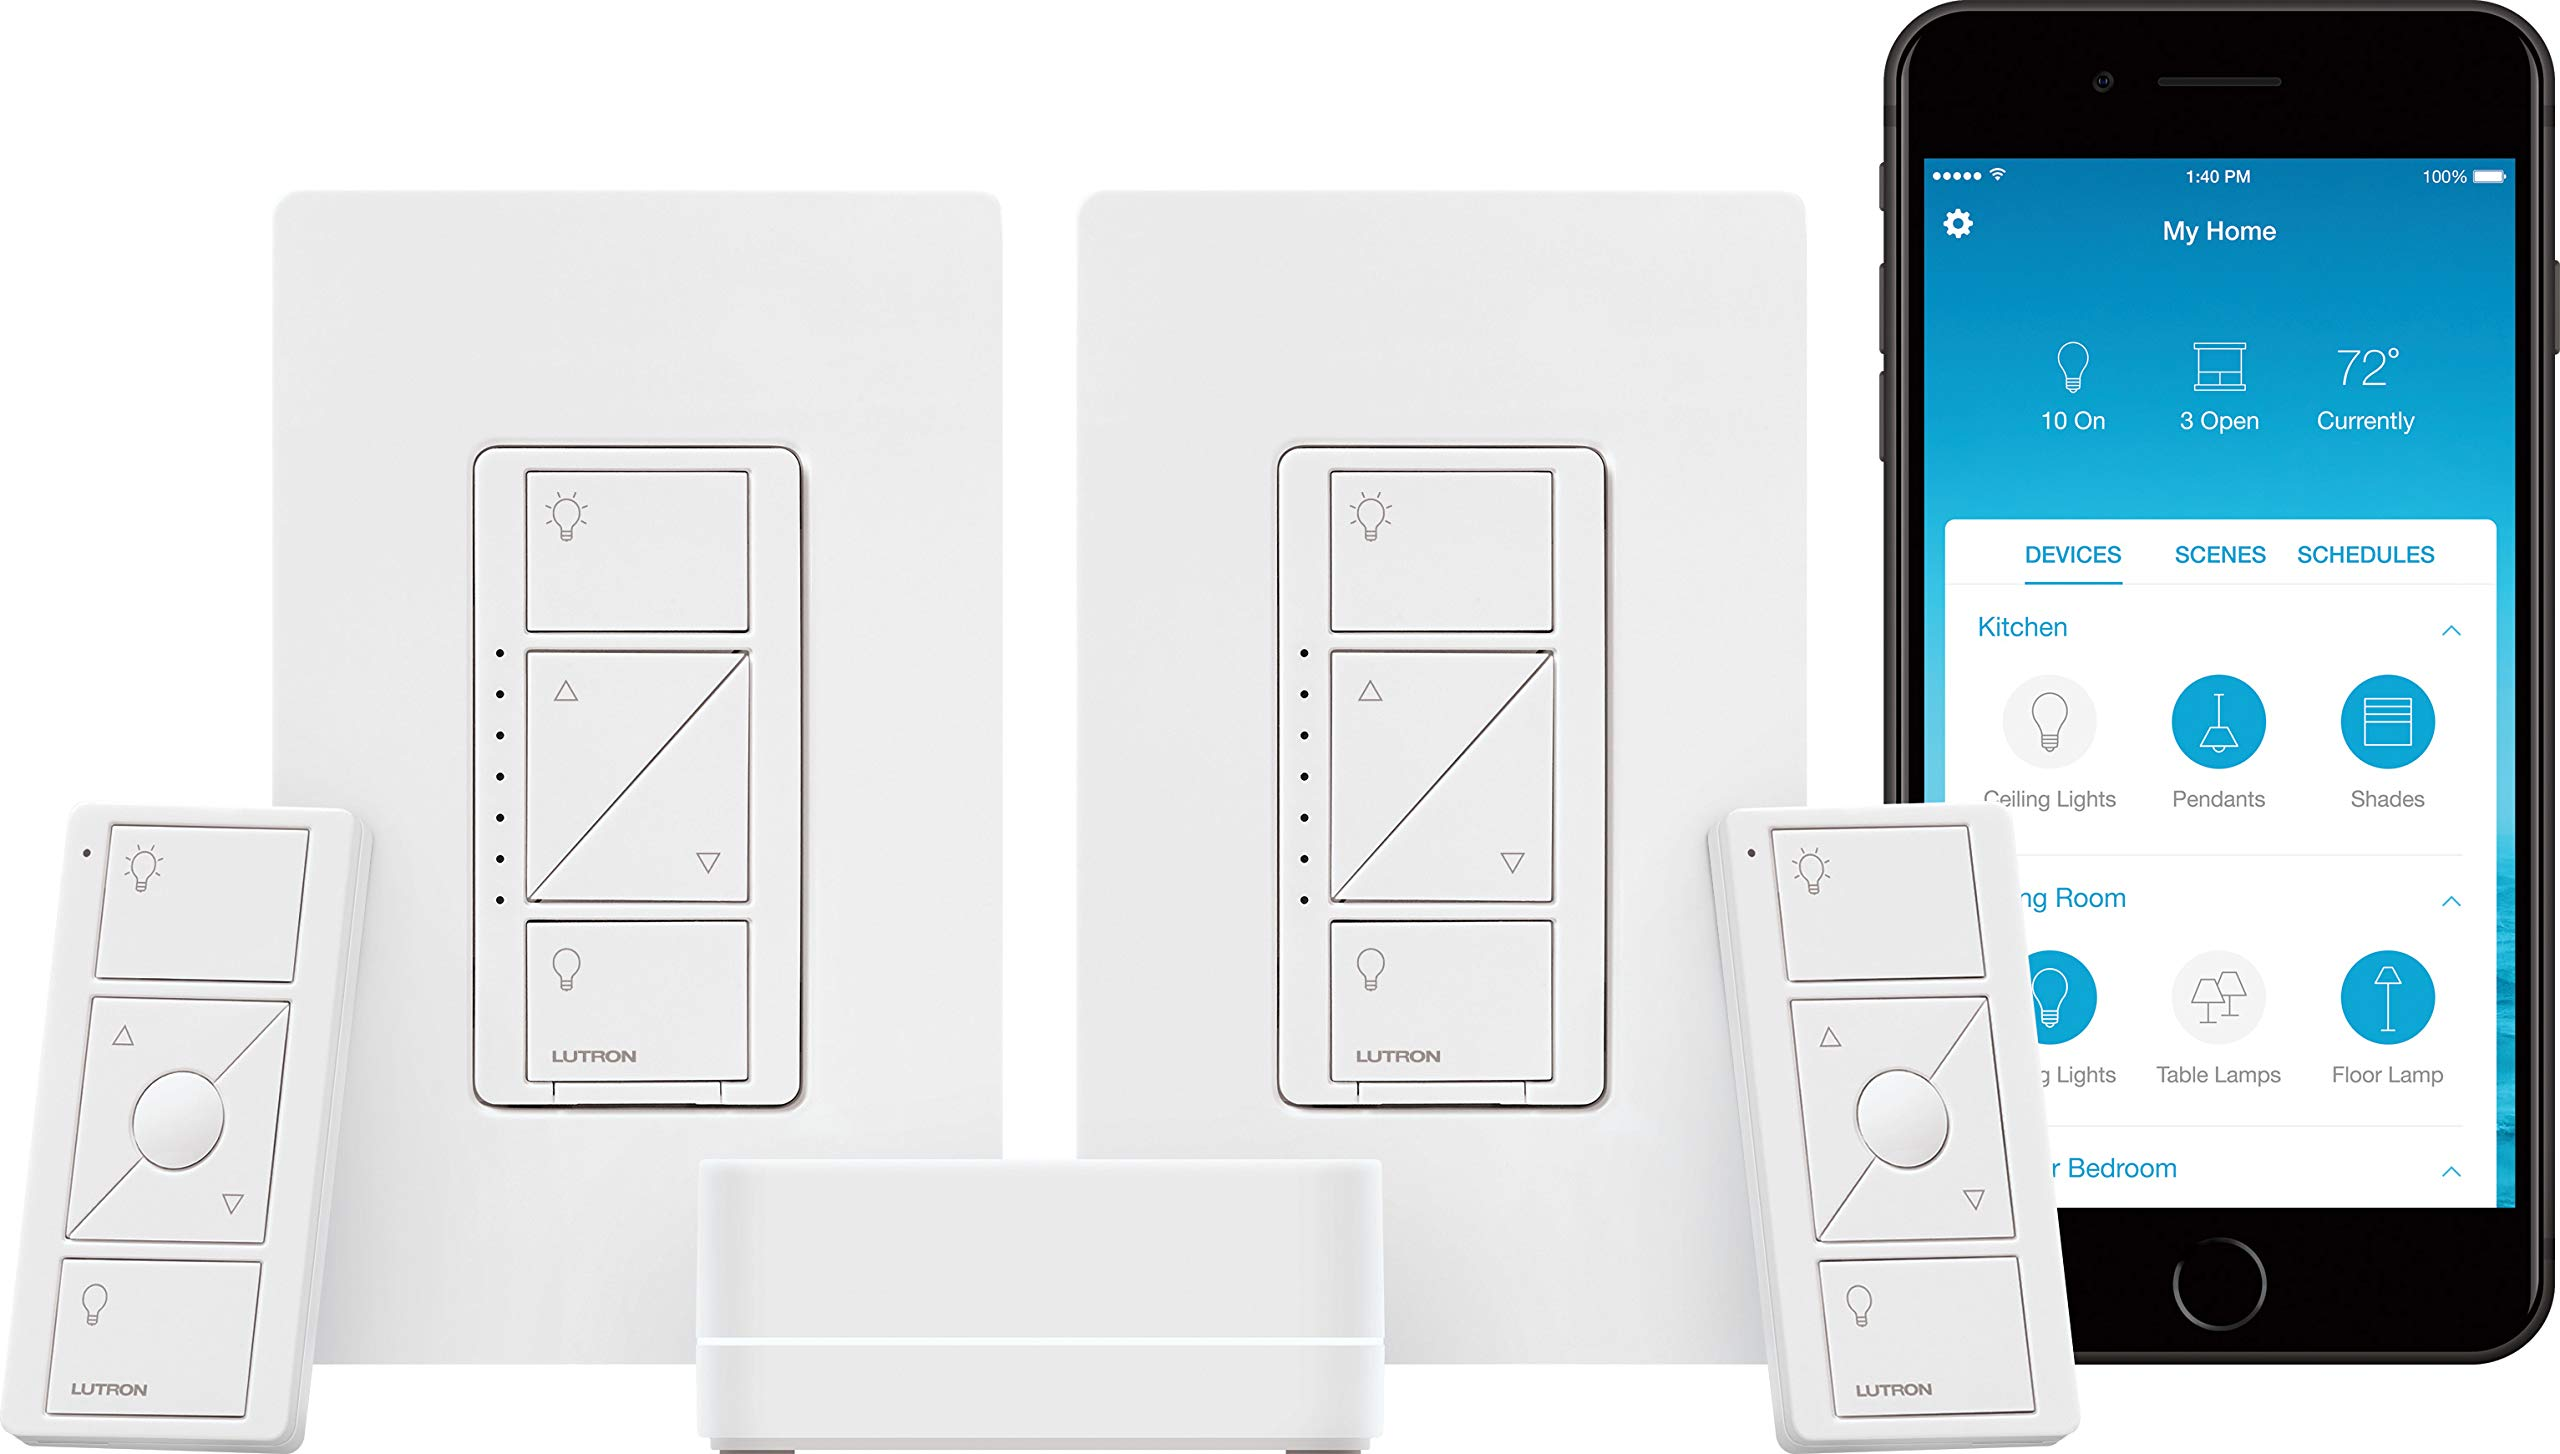 Lutron Caseta Wireless Smart Lighting Dimmer Switch (2 count) Starter Kit, P-BDG-PKG2W-A, Works with Alexa by Lutron